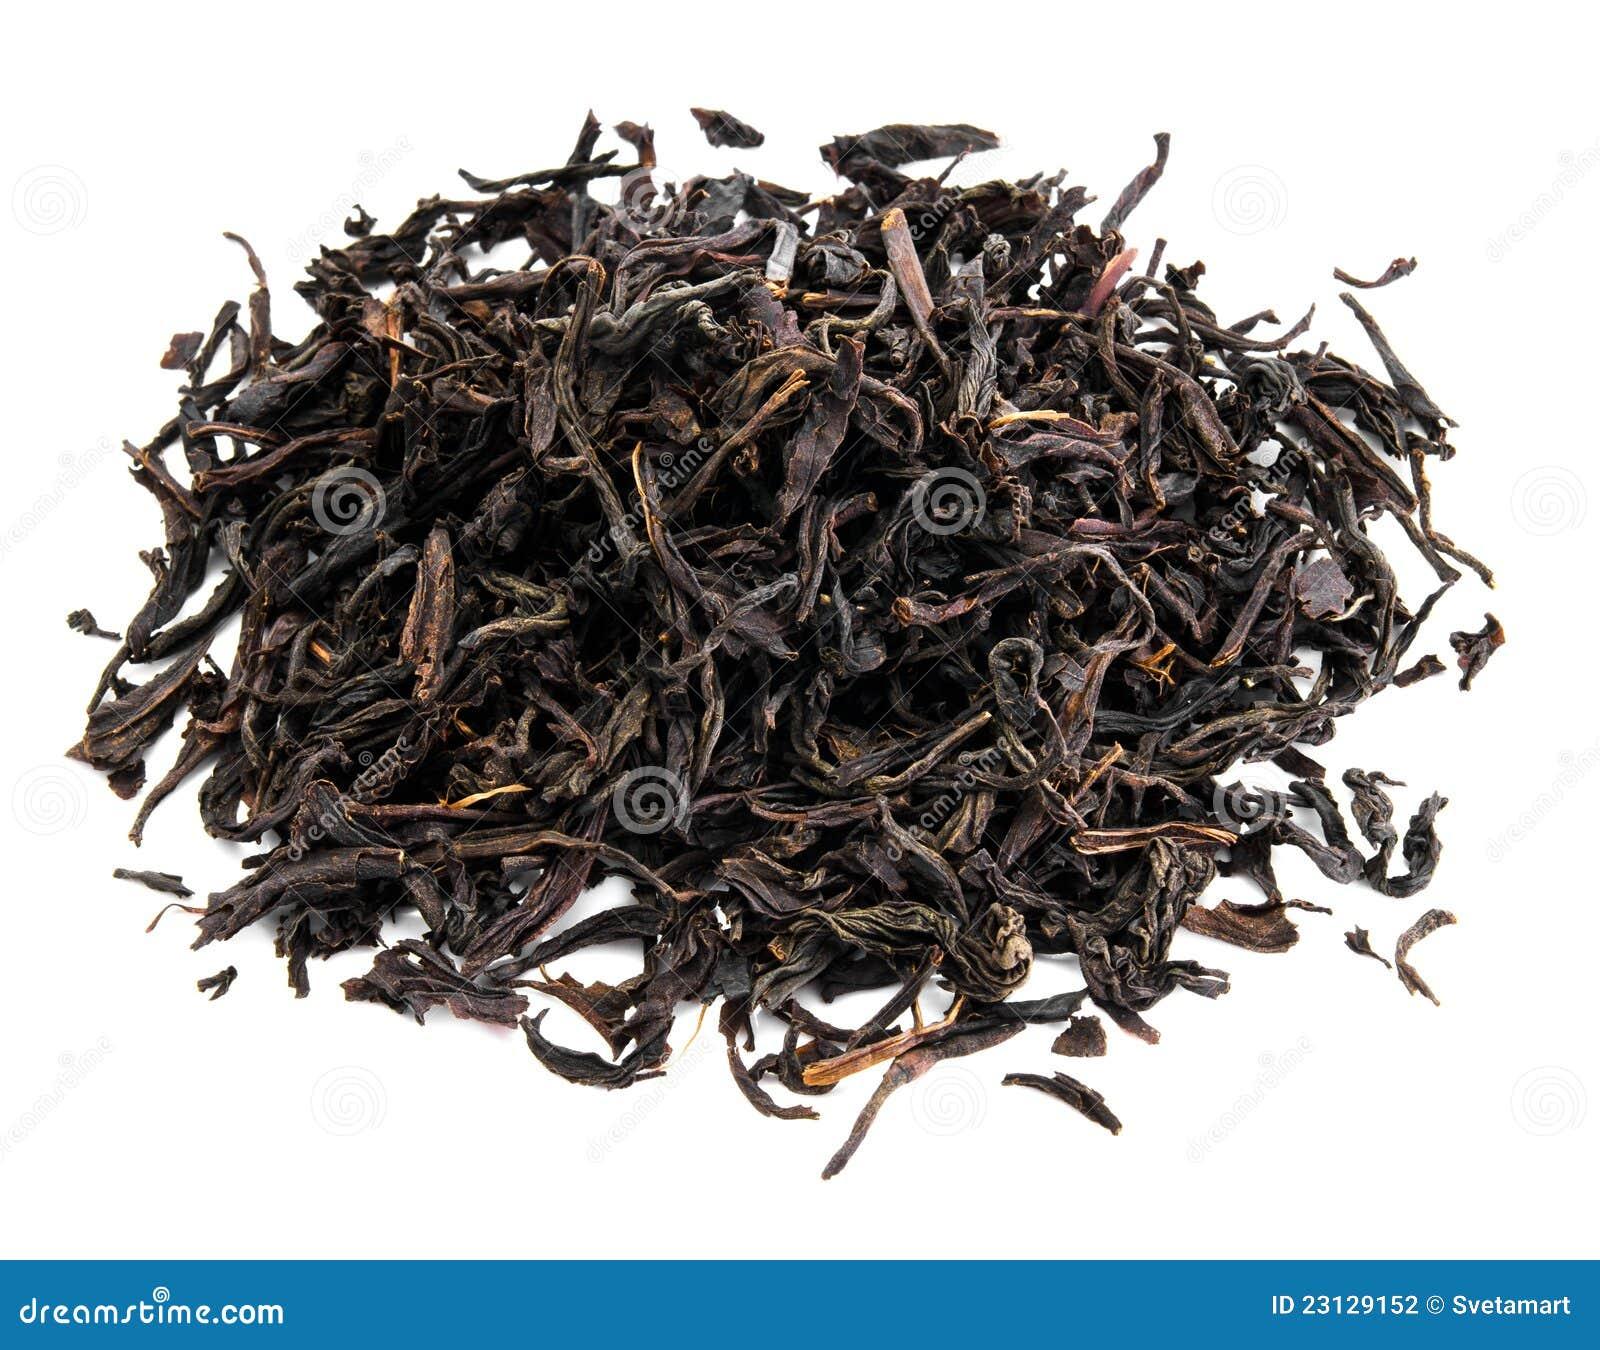 Black Dried Tea Leaves Wiring Diagrams Blazer Vacuum Diagram Http Wwwfixyacom Cars T11698649needvacuum Loose Stock Photo Image Of Heap Drink Rh Dreamstime Com Adding Water To Green